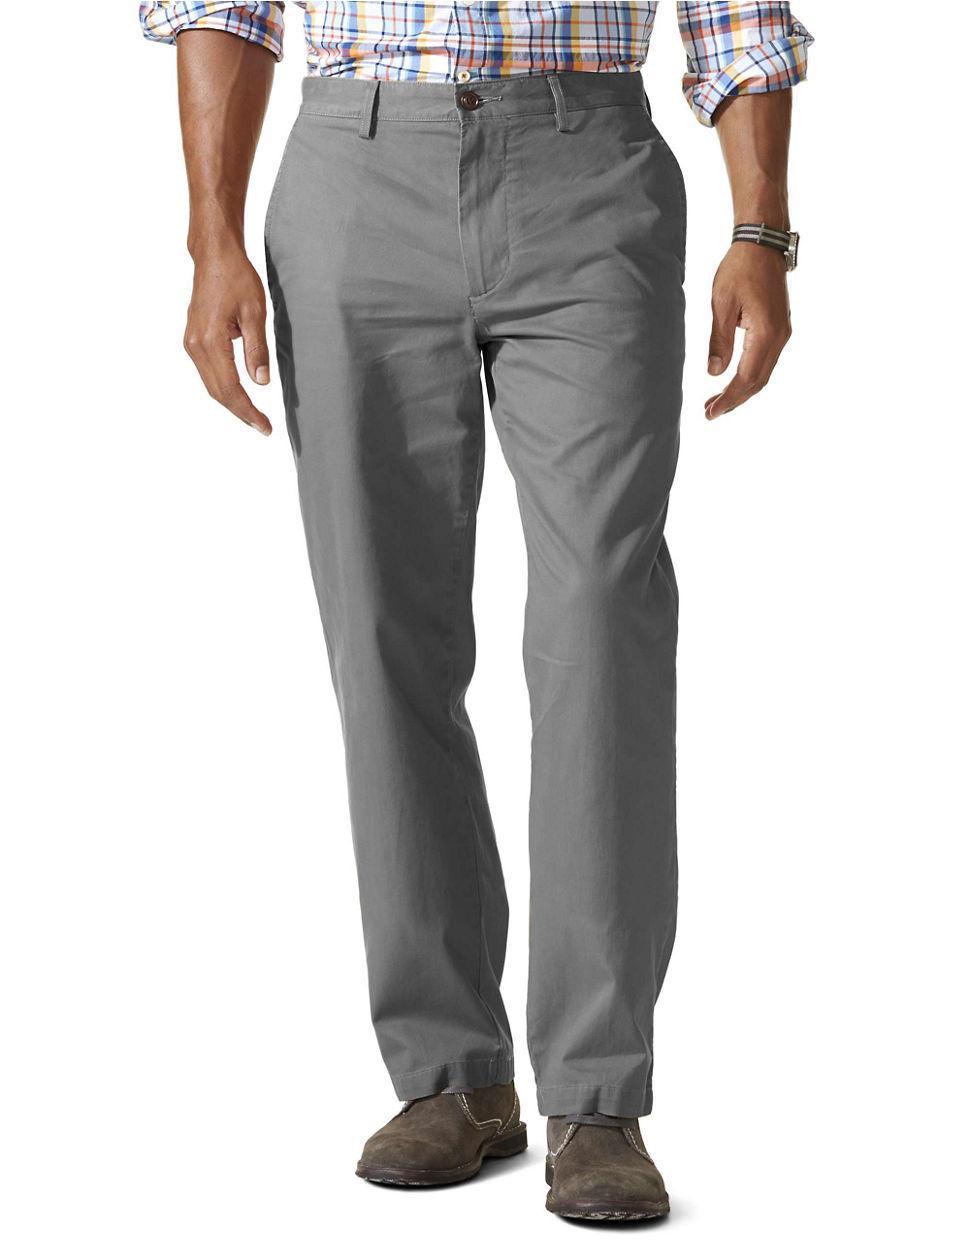 a86224d2 Mens Gray Khaki Pants | Pant So